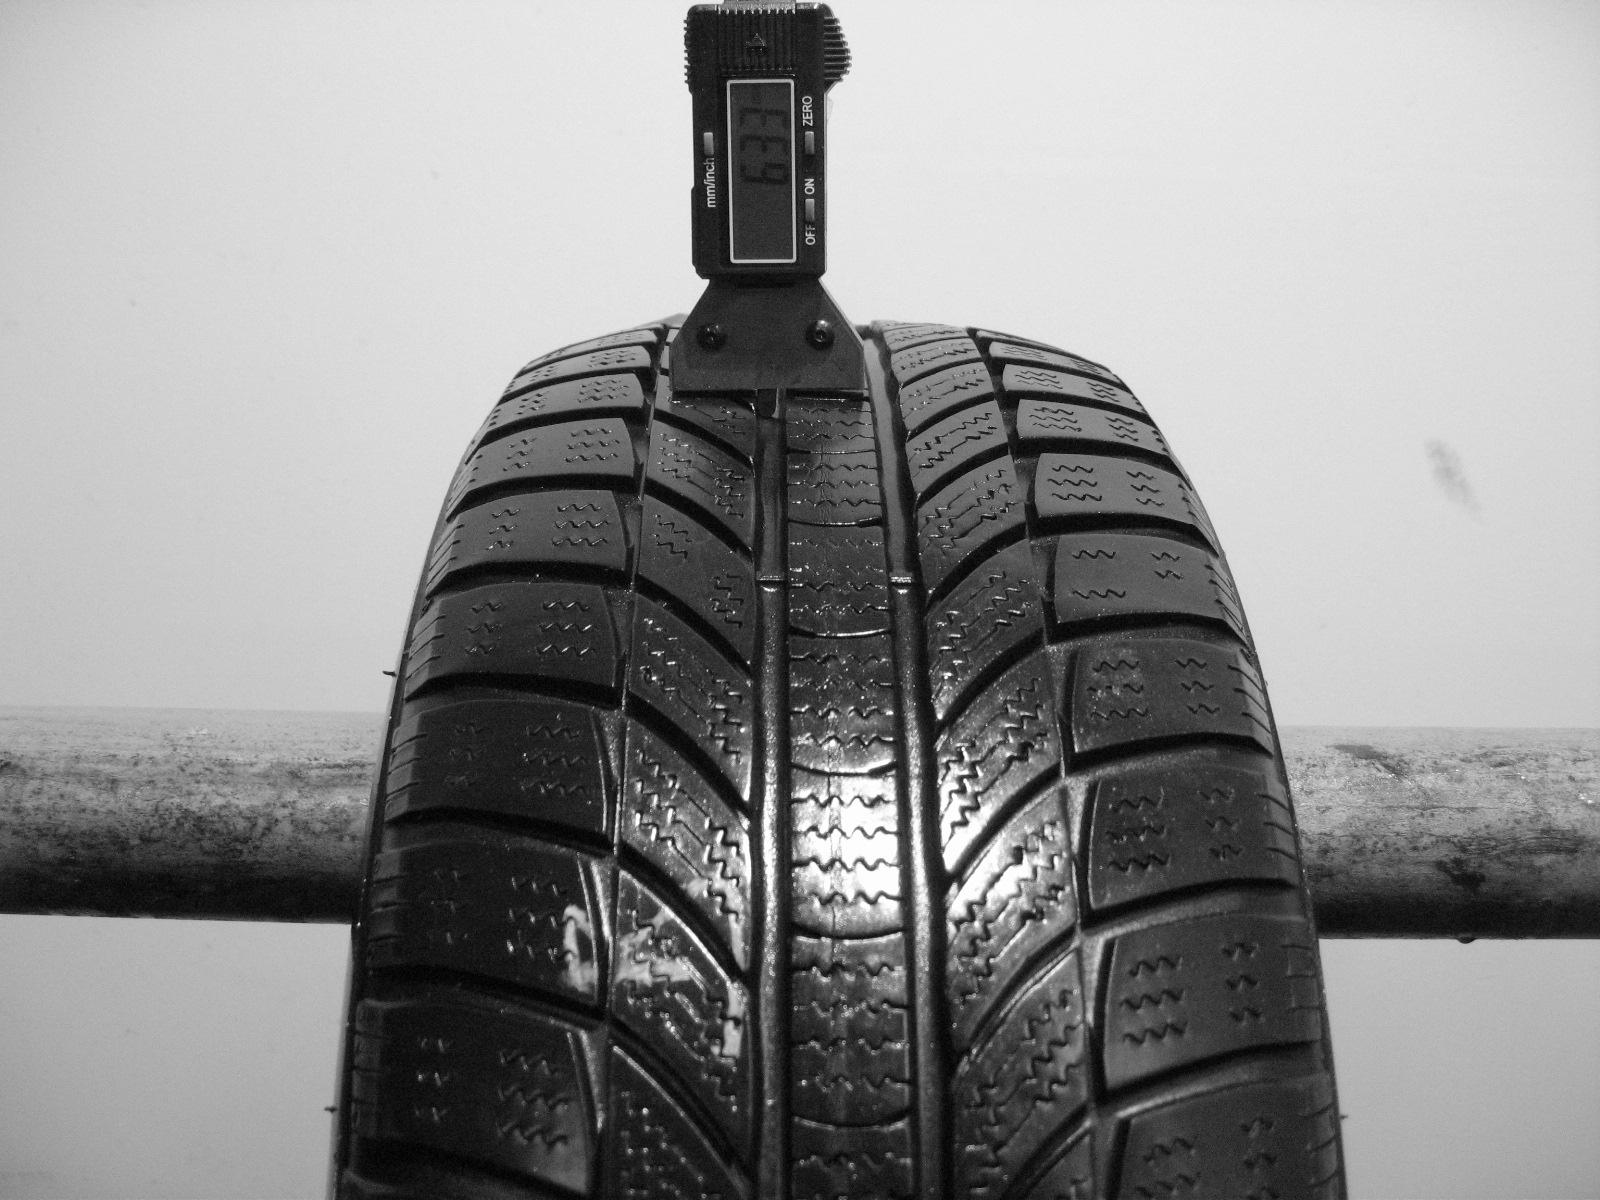 Použité-Pneu-Bazar - 185/60 R14 CHAMPIRO WINTER PRO -kusovka-rezerva 3mm